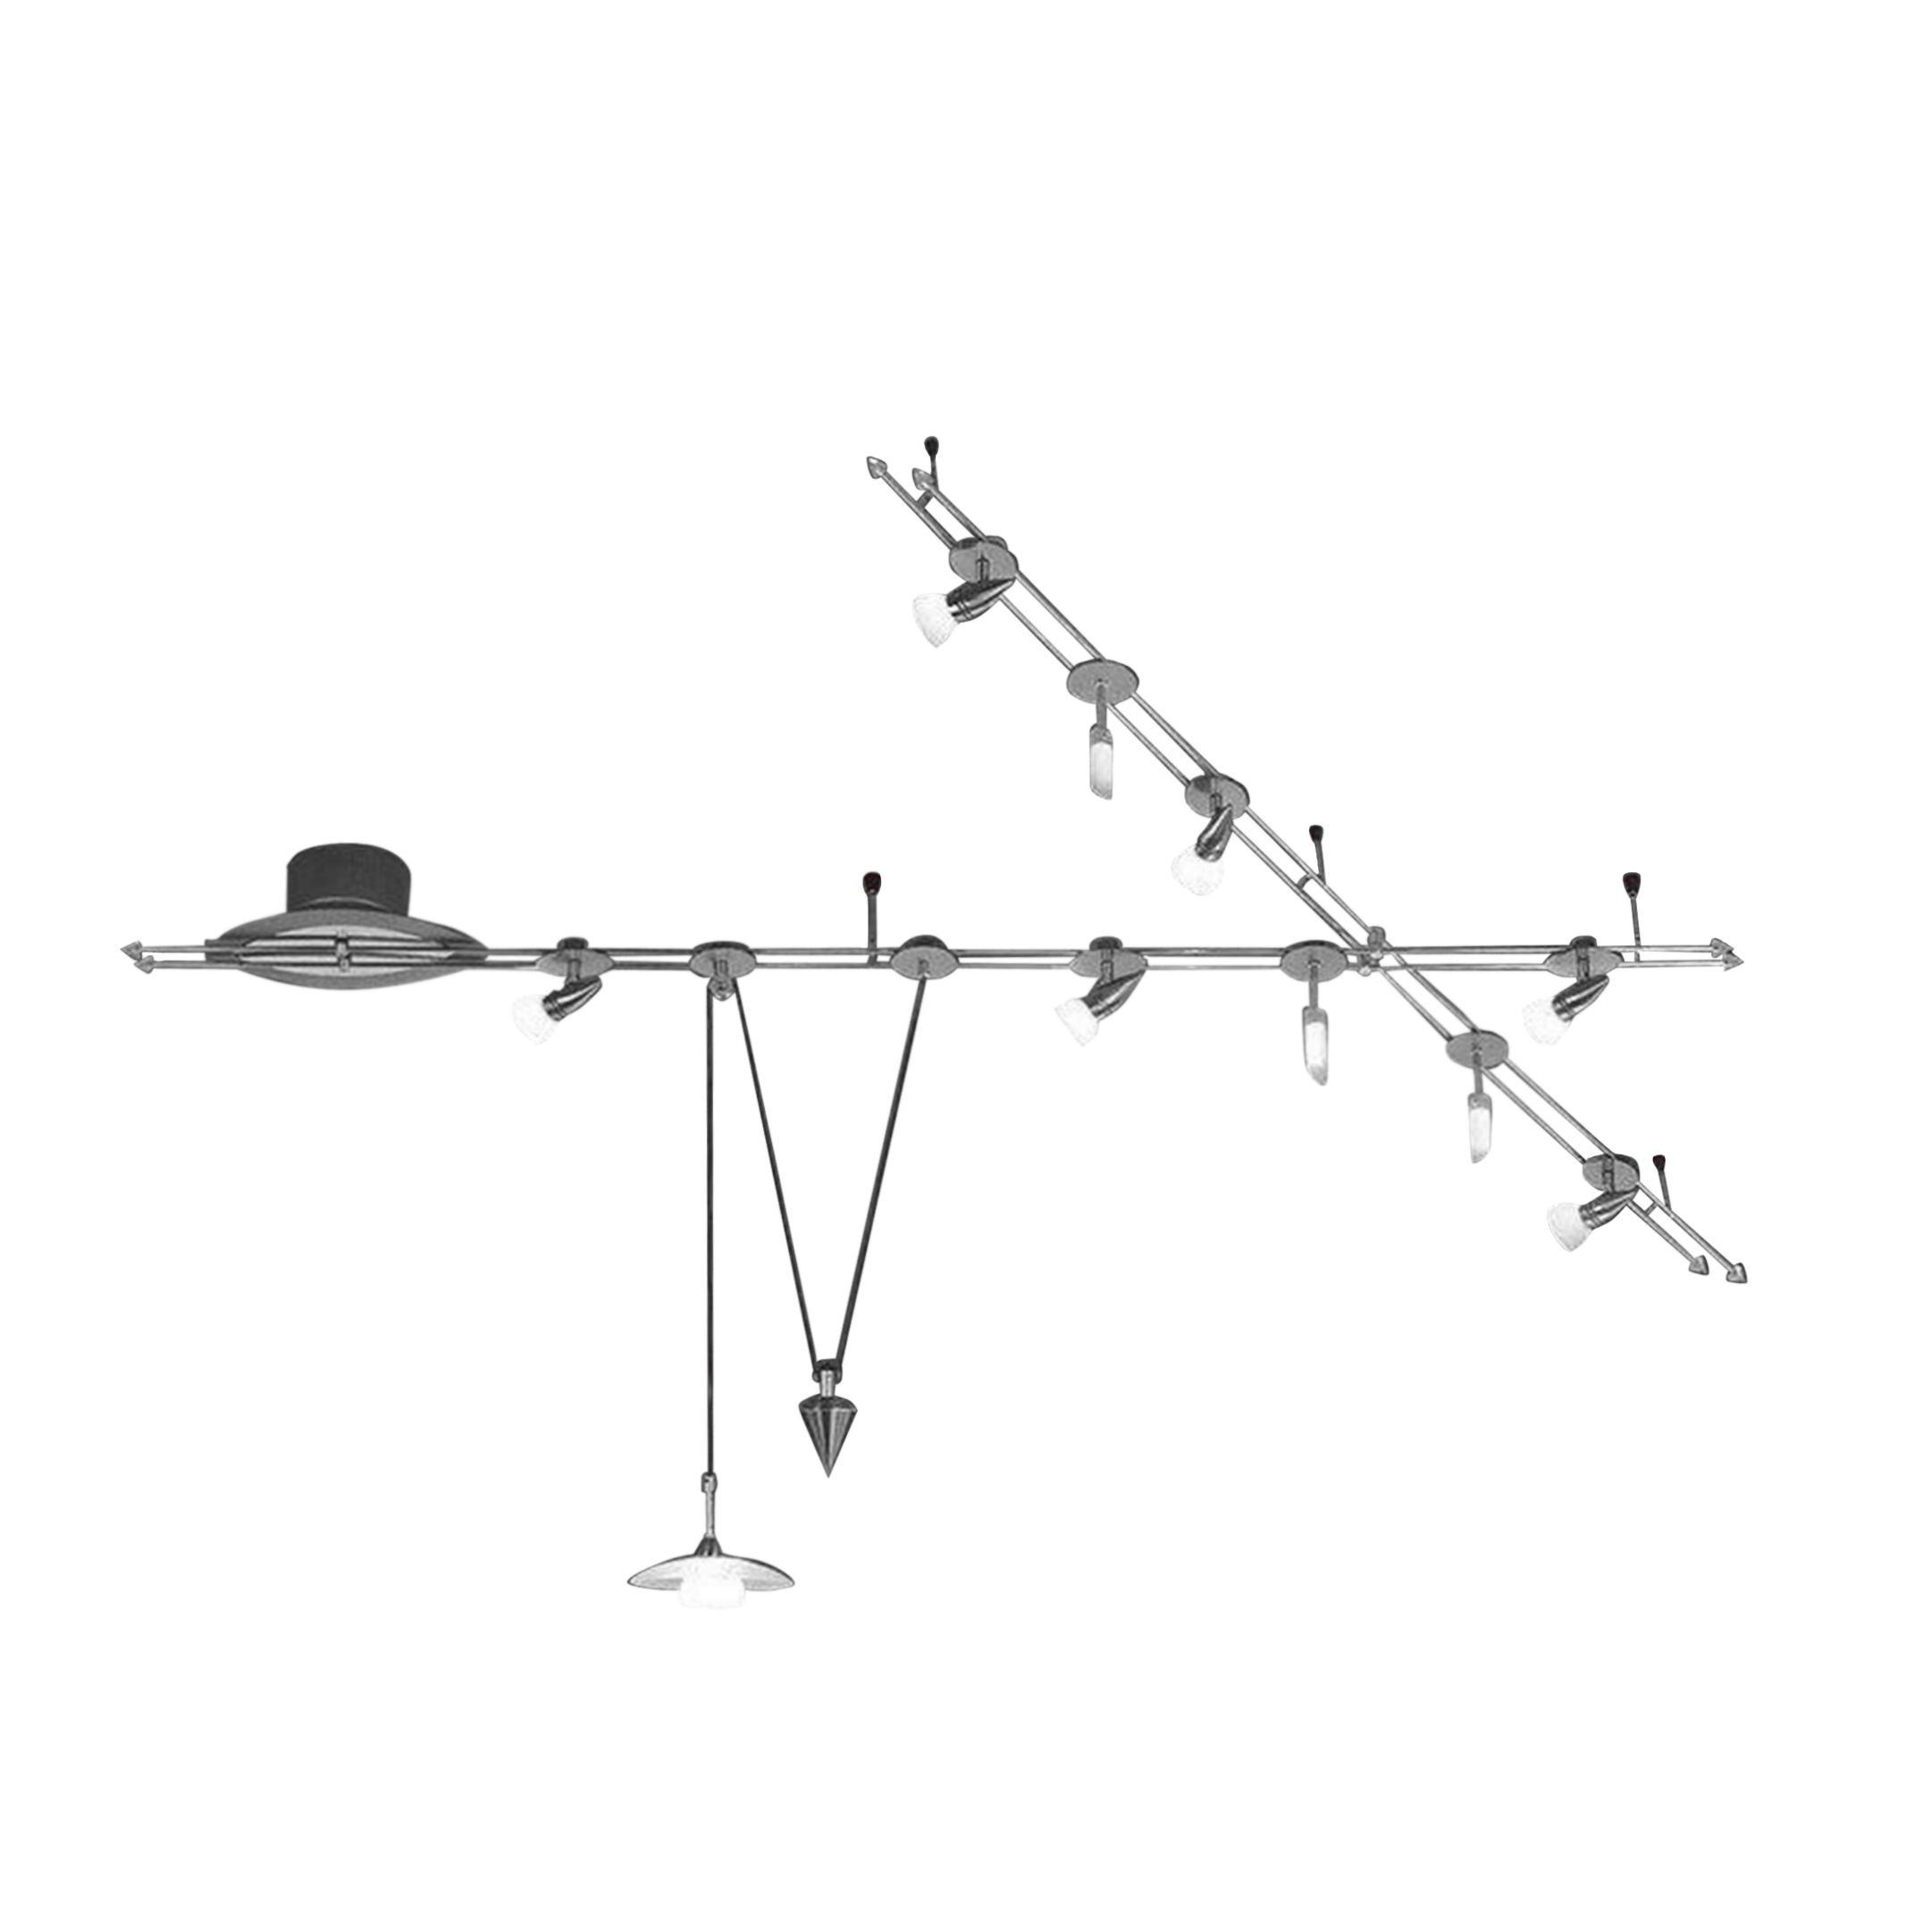 wofi leuchten wofi tangens 158 deckenstrahler nickel matt 10 flammig preisvergleich g nstig. Black Bedroom Furniture Sets. Home Design Ideas